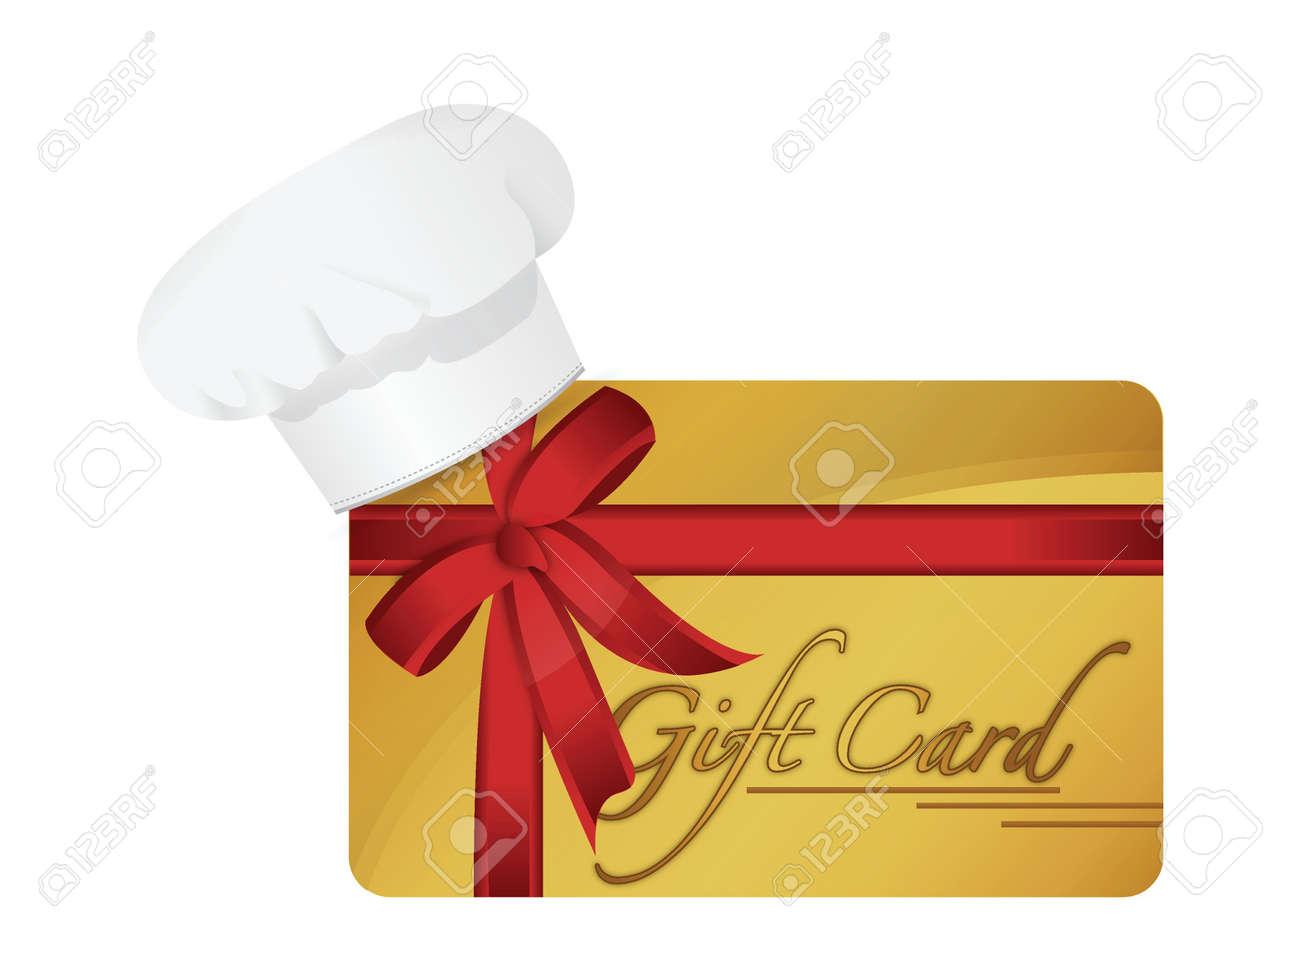 restaurant gift card illustration design over a white background Stock Vector - 19802504